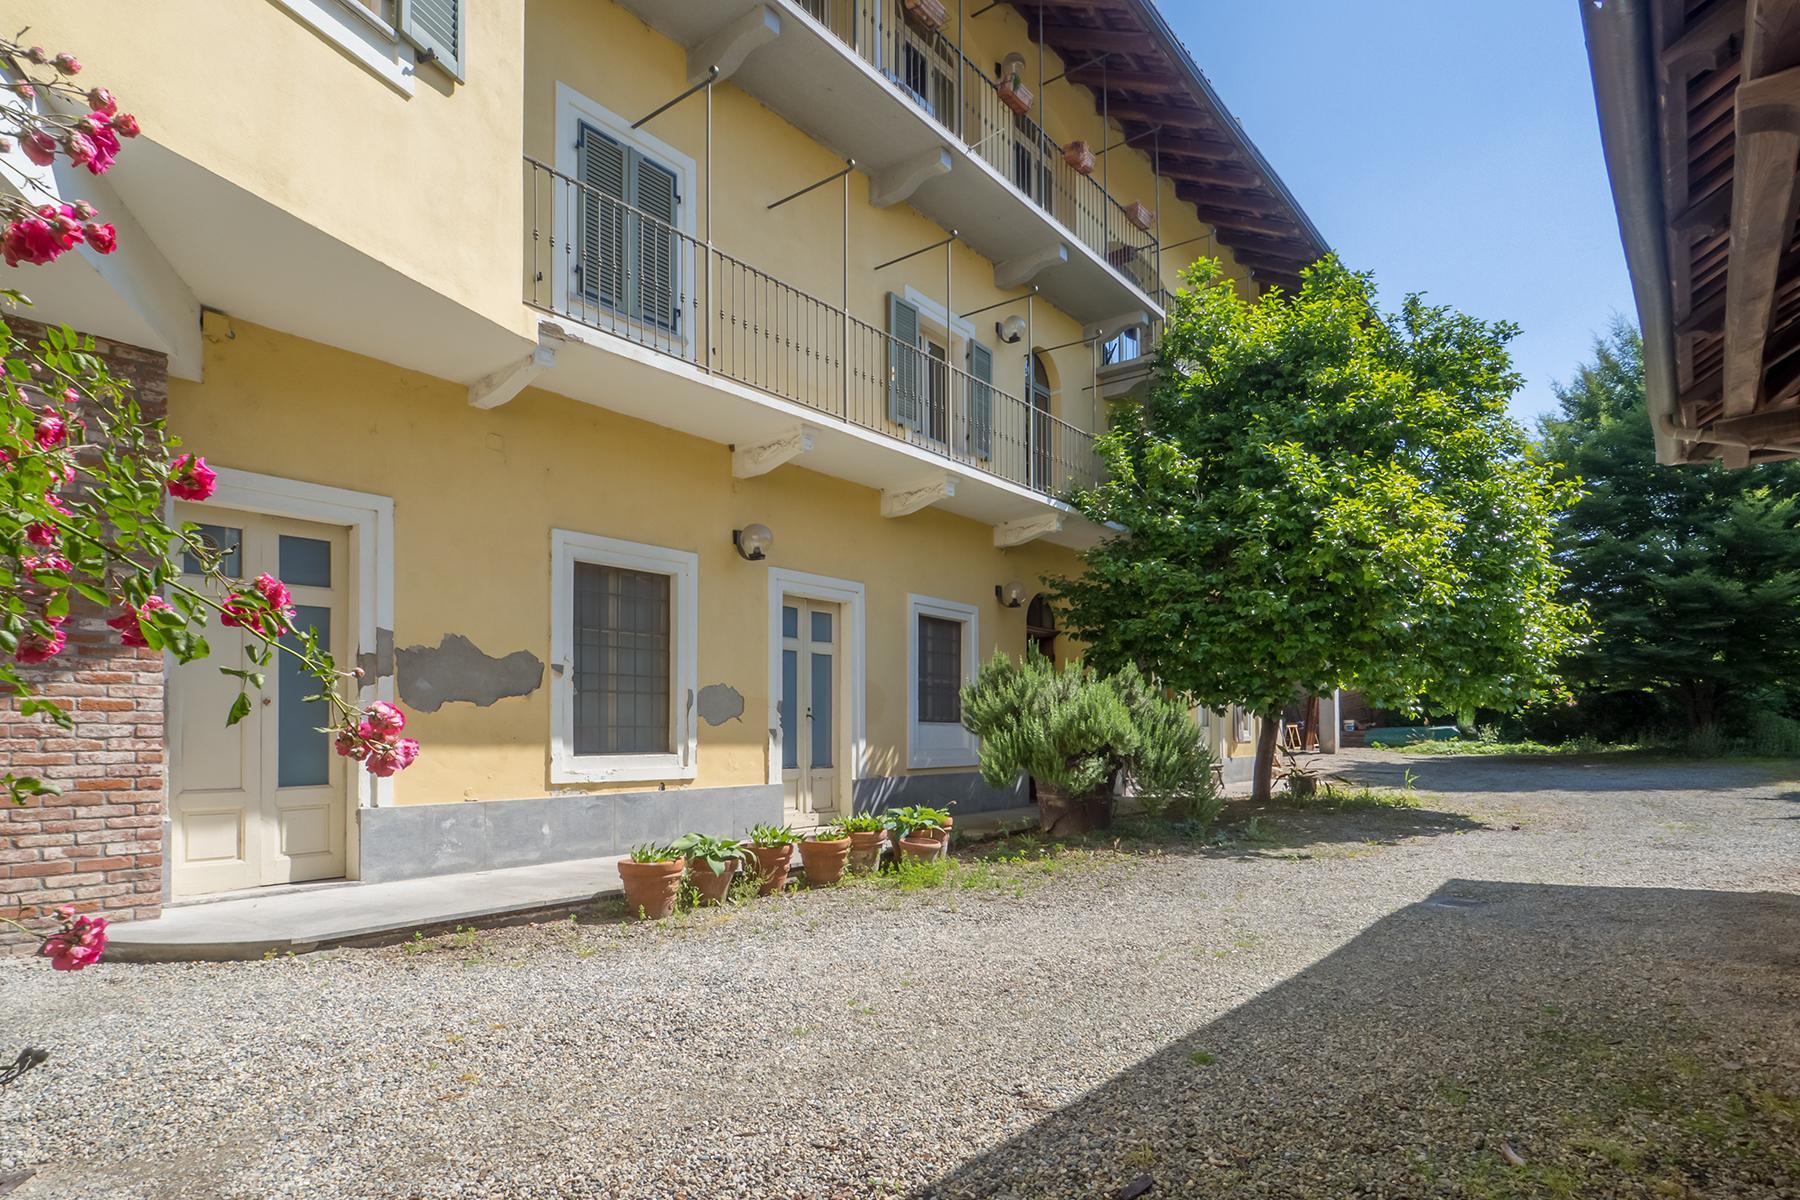 Elegant apartment in the Canavese region - 20